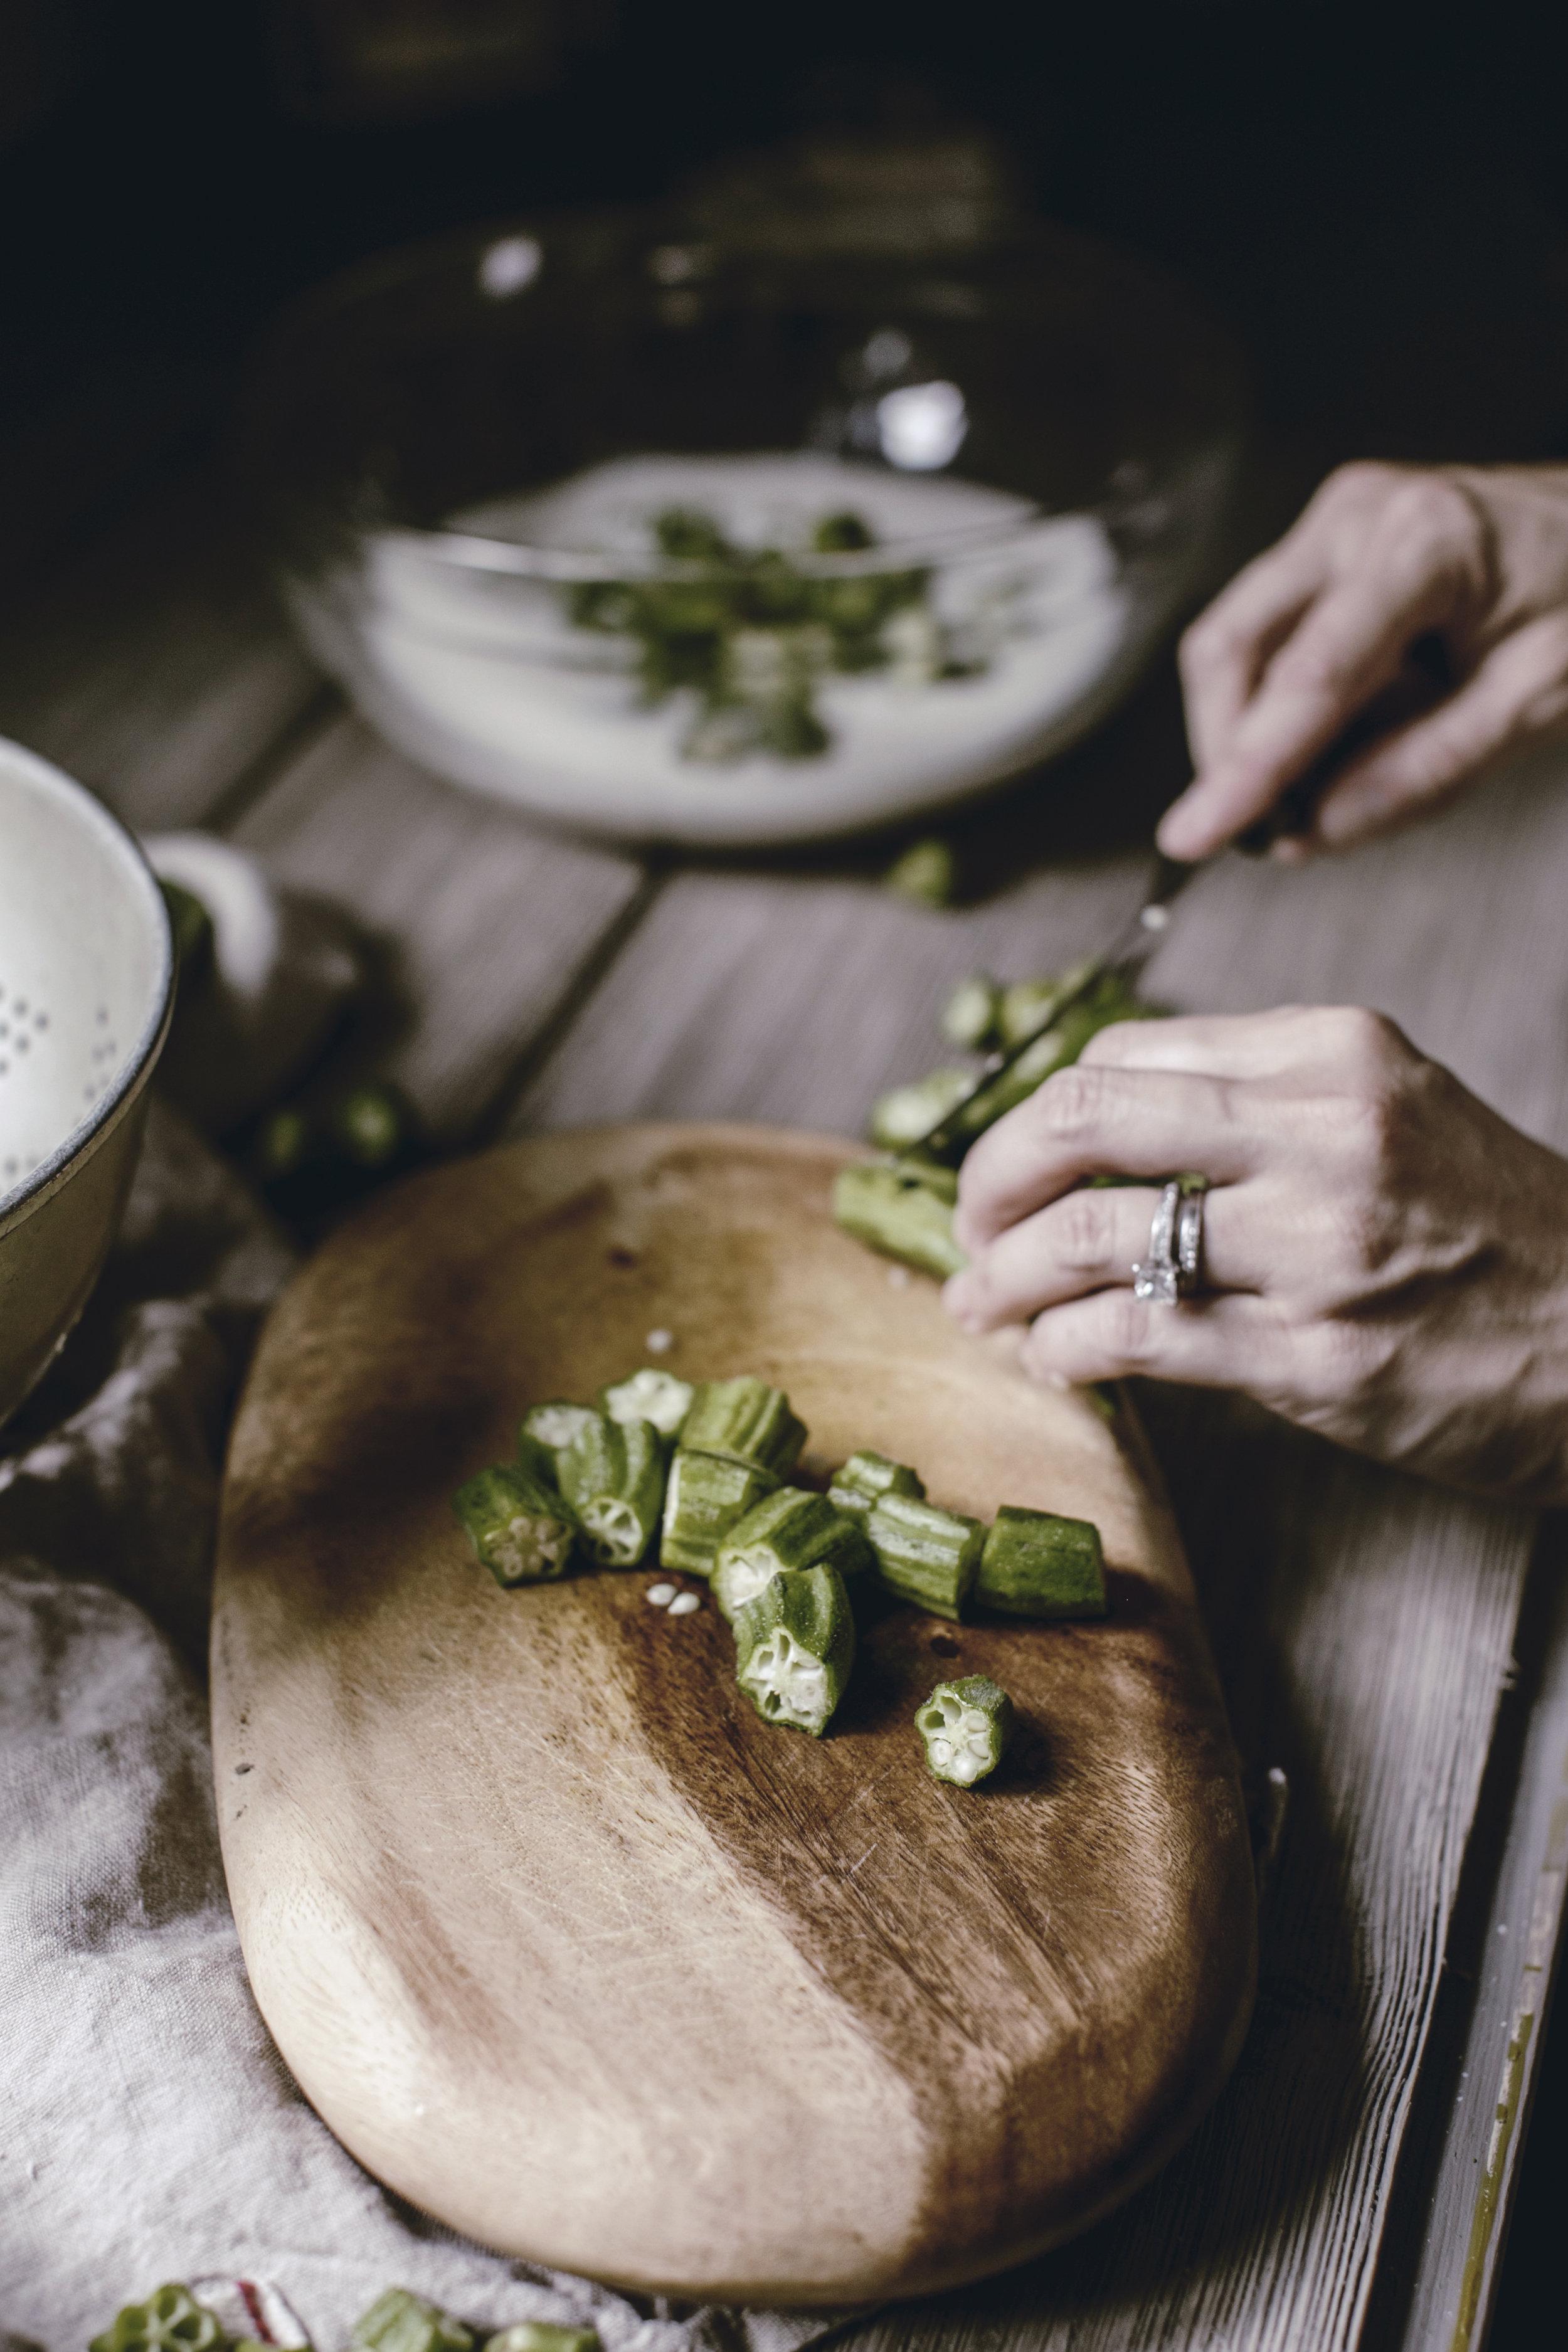 cutting okra / fried okra / heirloomed